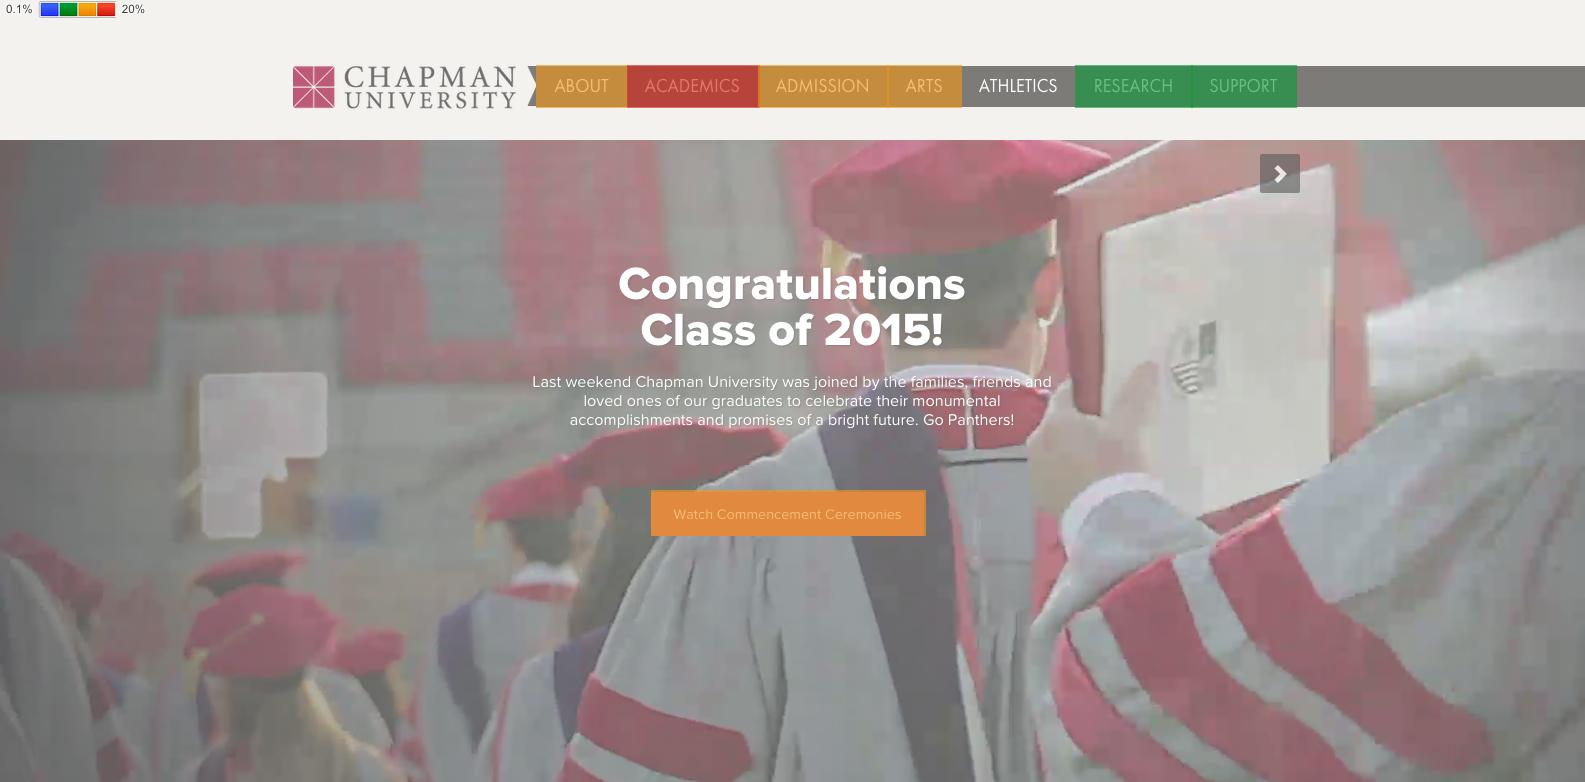 Chapman University homepage with heatmap.